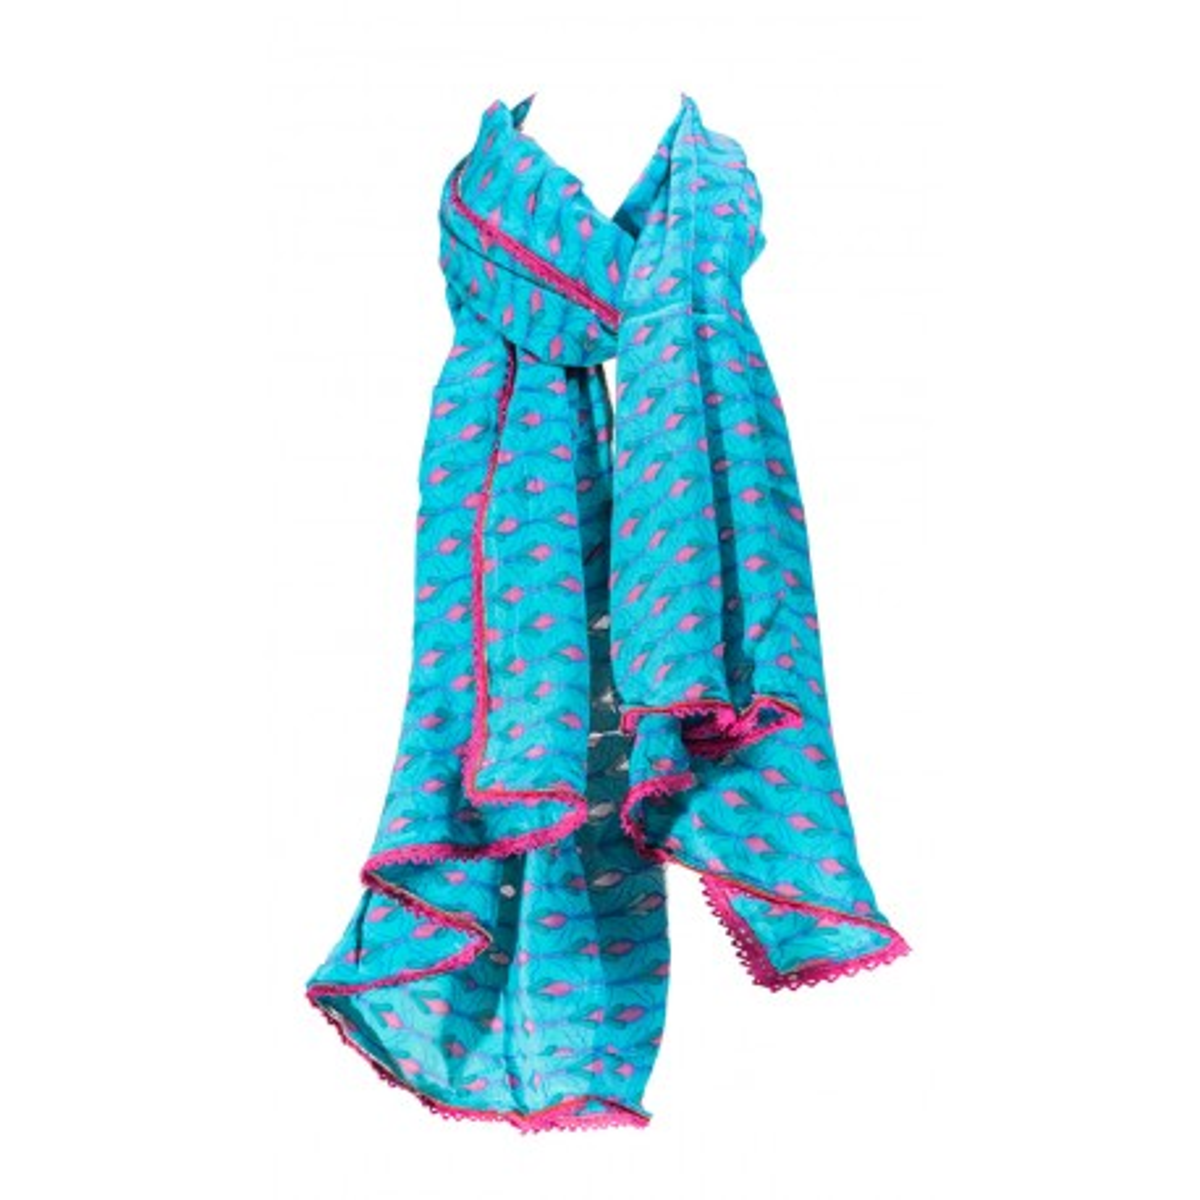 Foulard femme coton rose et bleu Tulipe